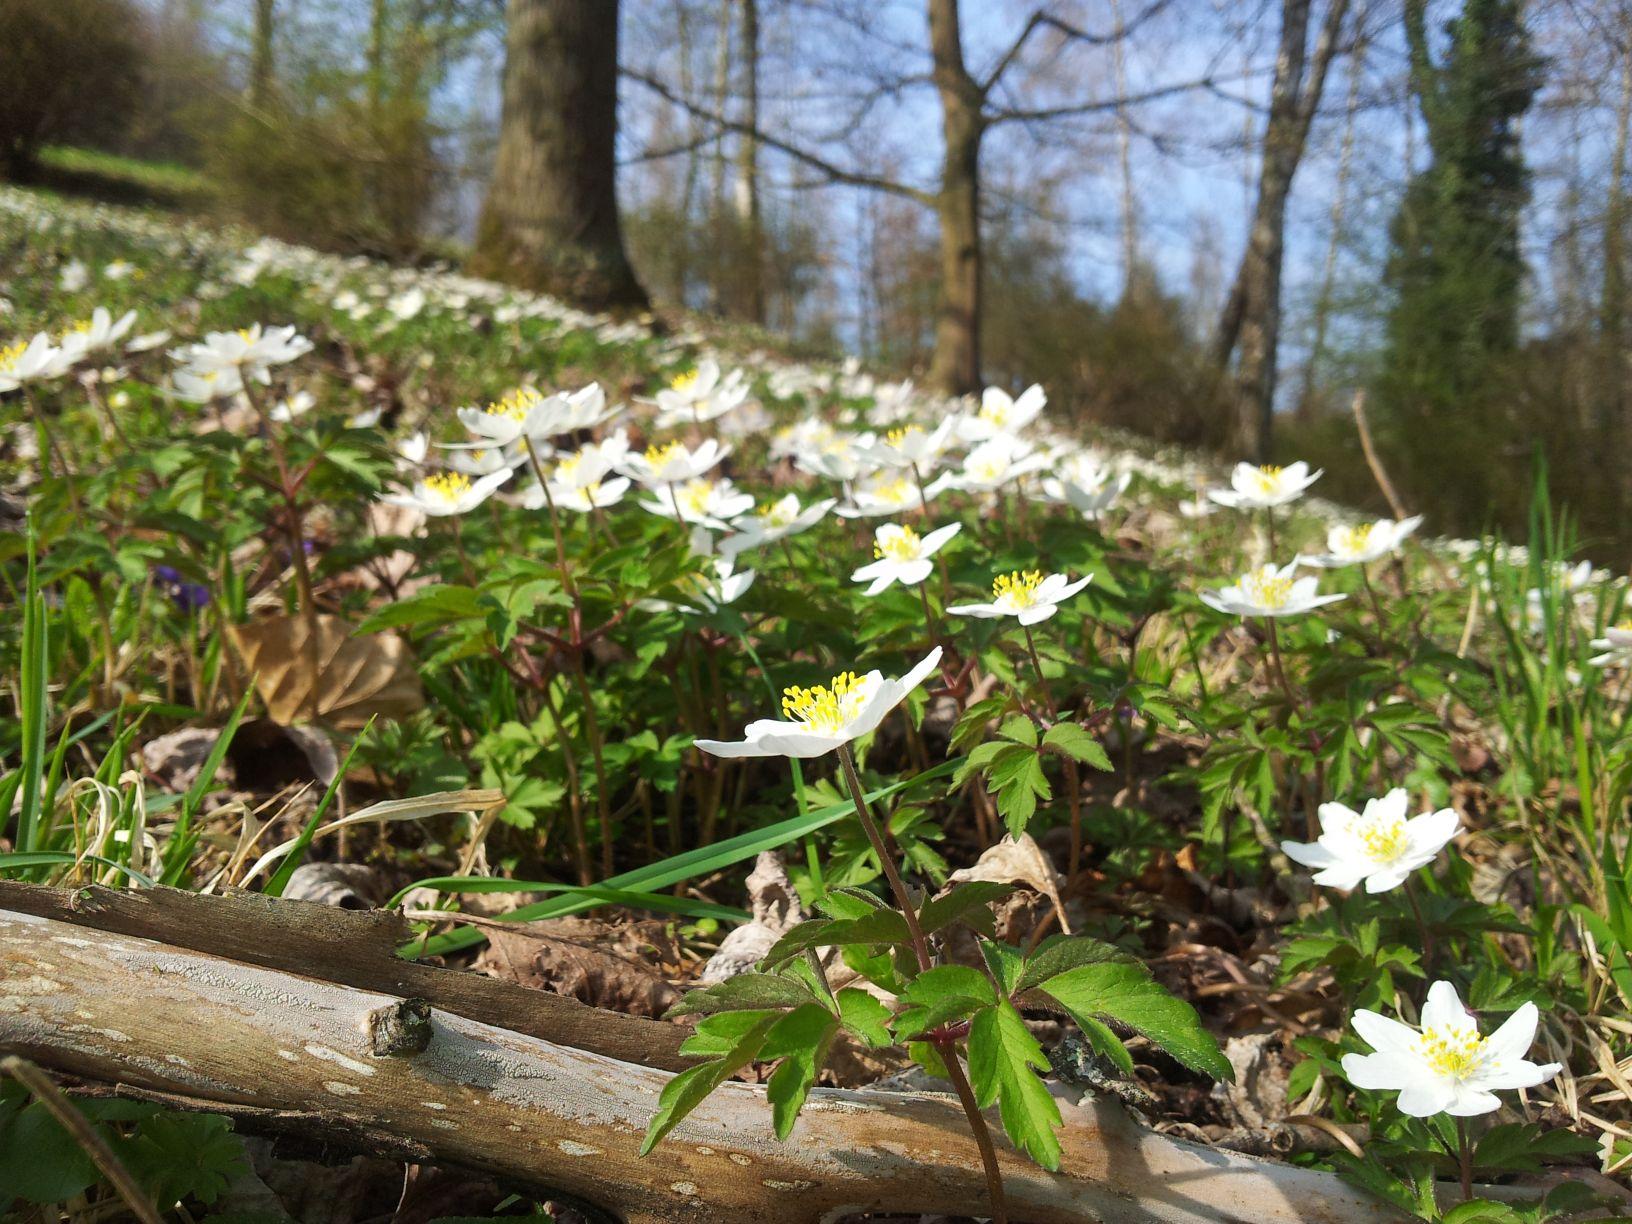 ABGESAGT: Pflanzen im Frühlingswald